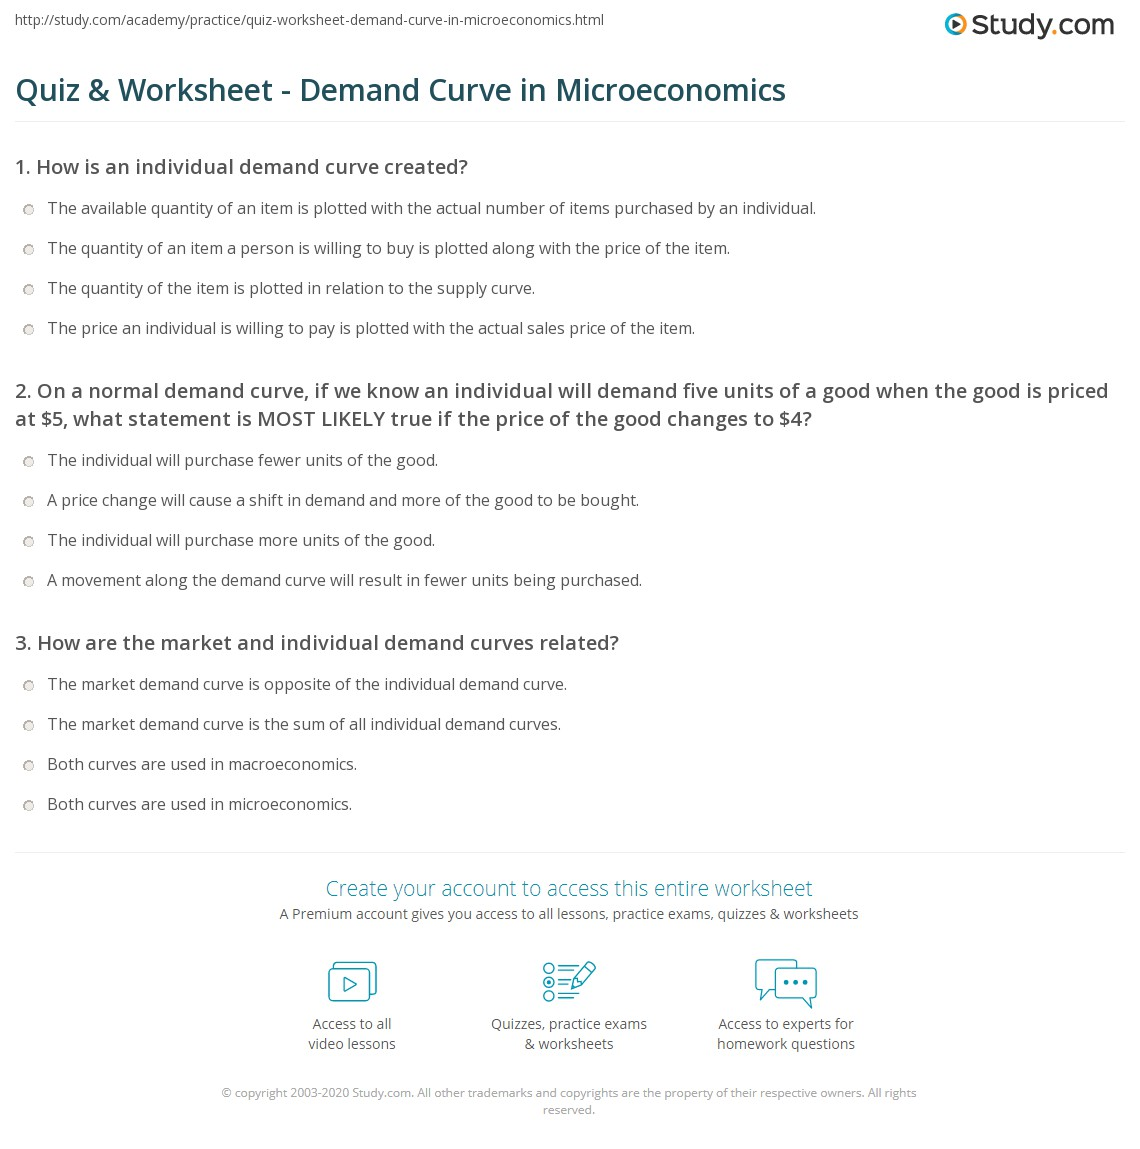 Quiz & Worksheet - Demand Curve in Microeconomics | Study.com